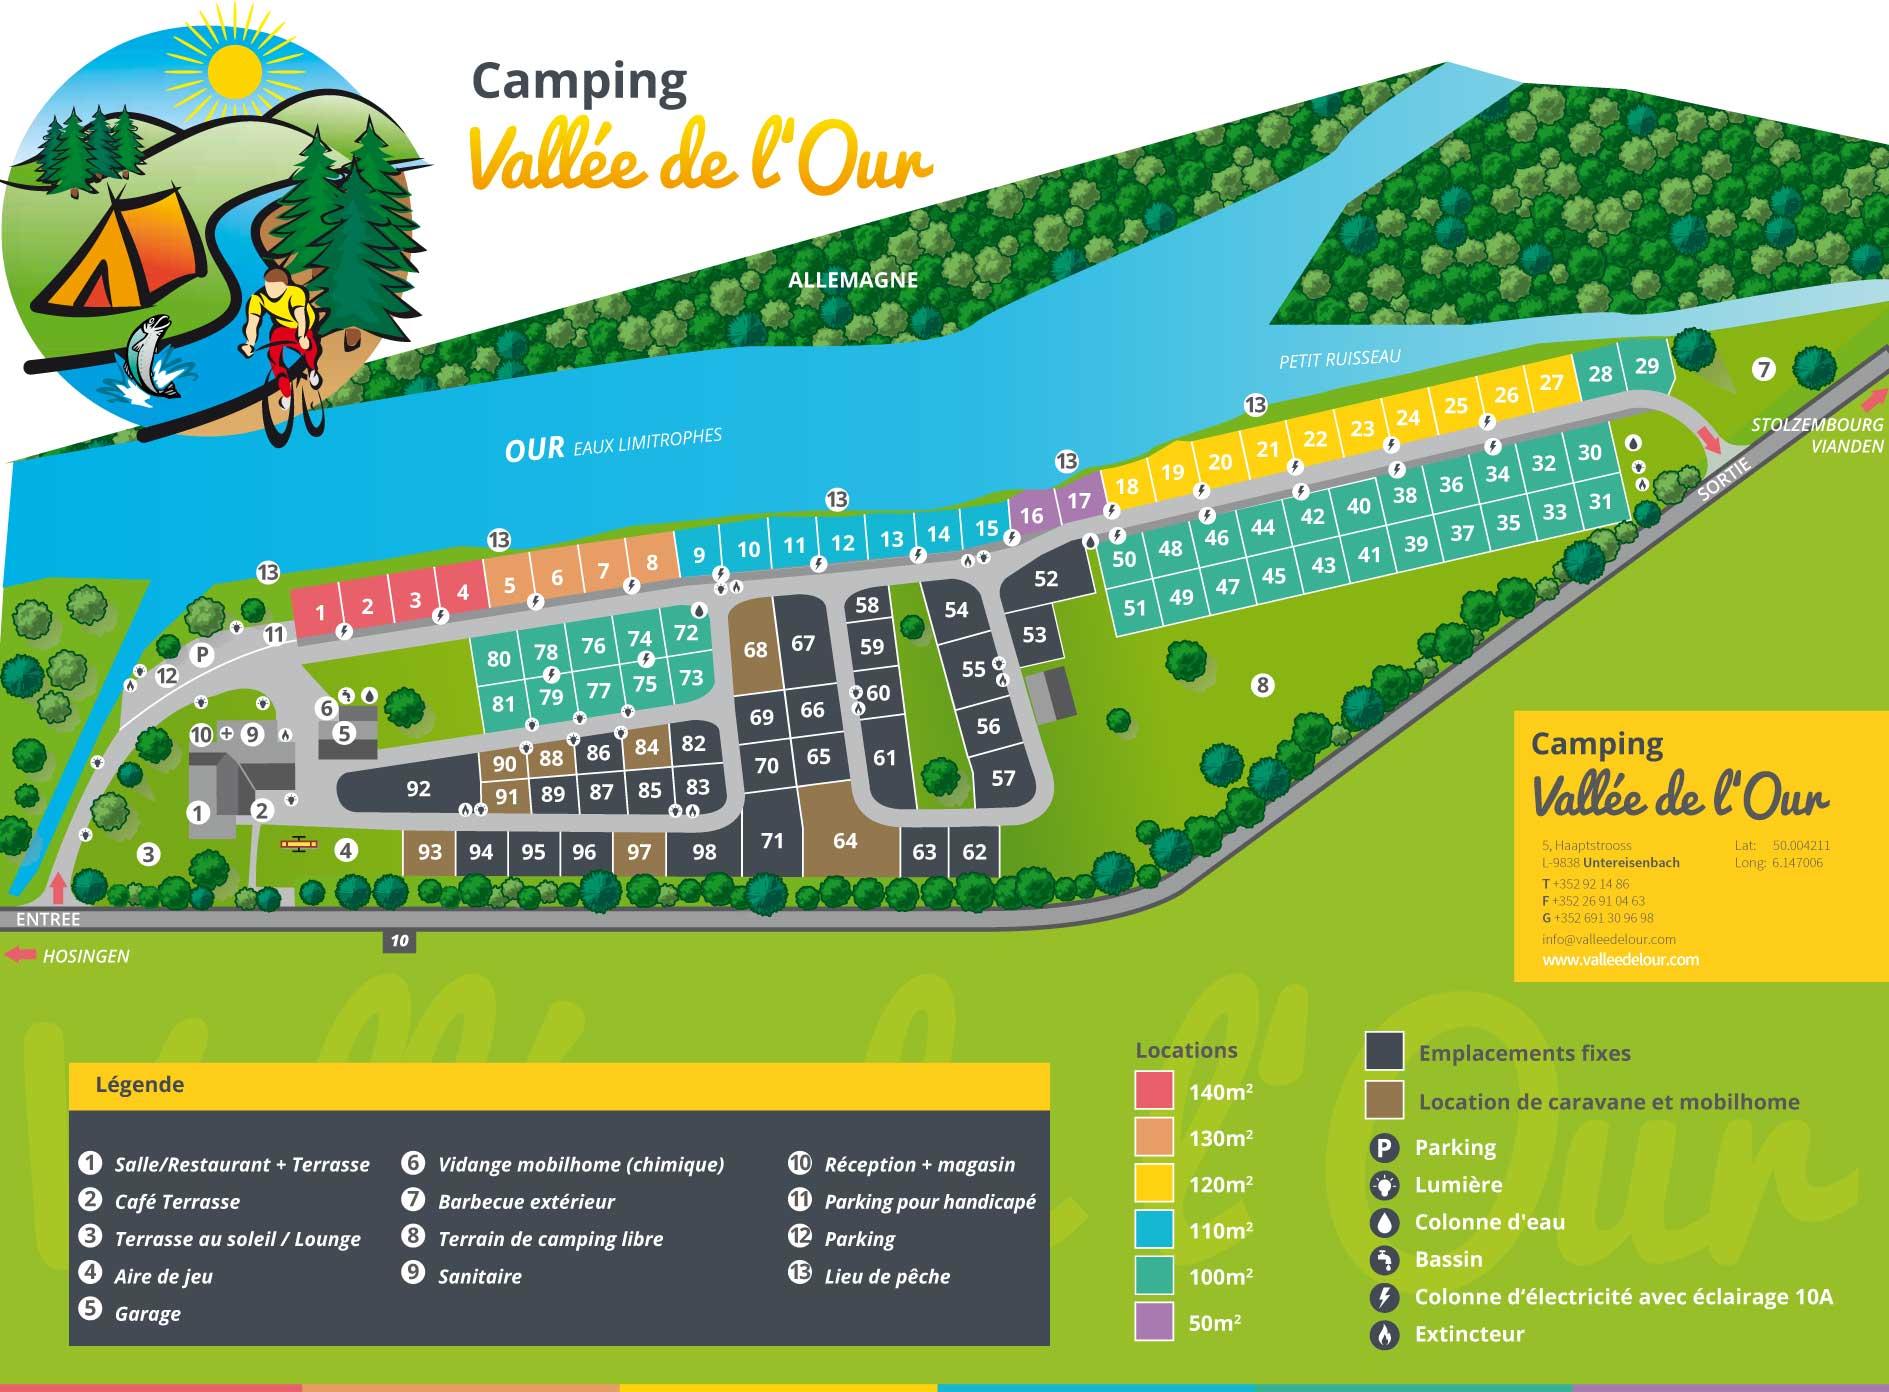 valleedelour_Plan-Camping_FR